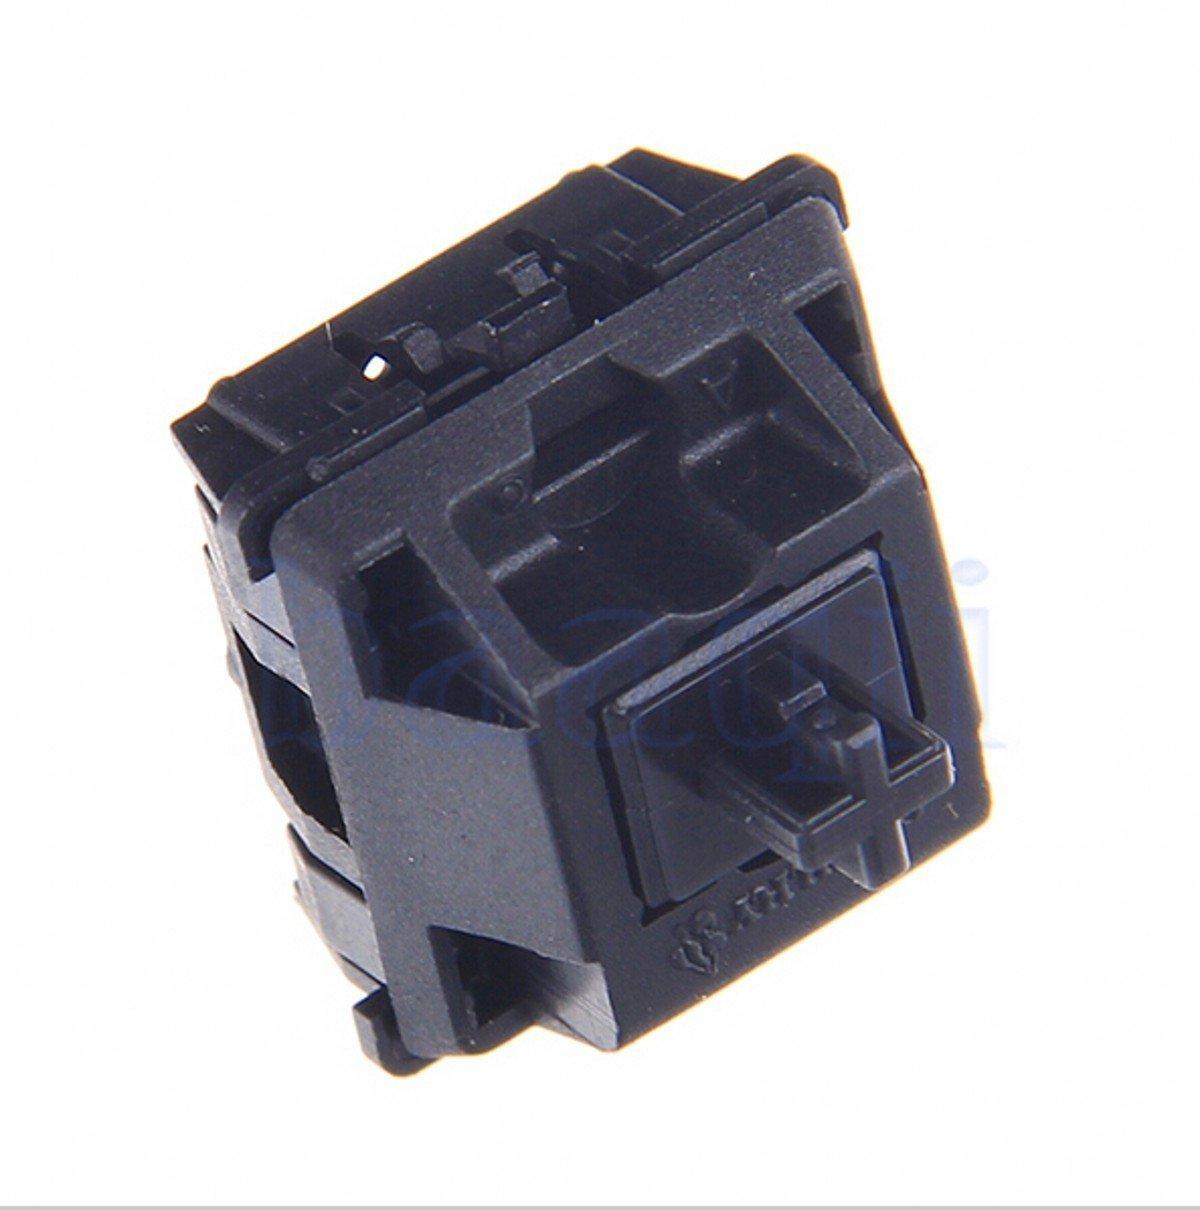 CHENGYIDA 10PCS CHERRY MX Series Keyswitches Black(Cyan) - Keyboards Switches GENUINE Replacement-ORIGINAL KEYBOARD SWITCH Ltd.